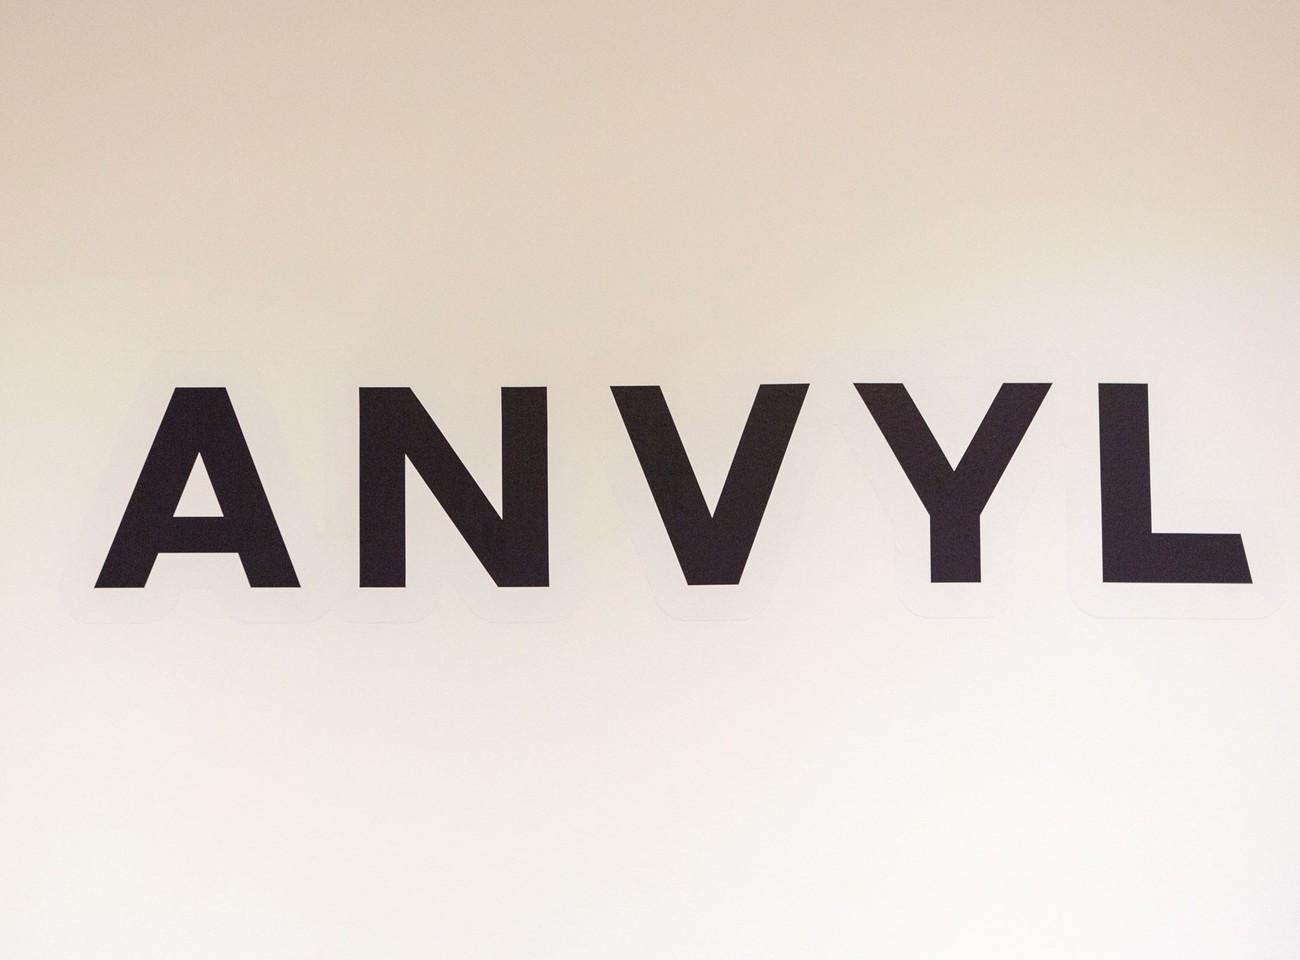 Anvyl Careers